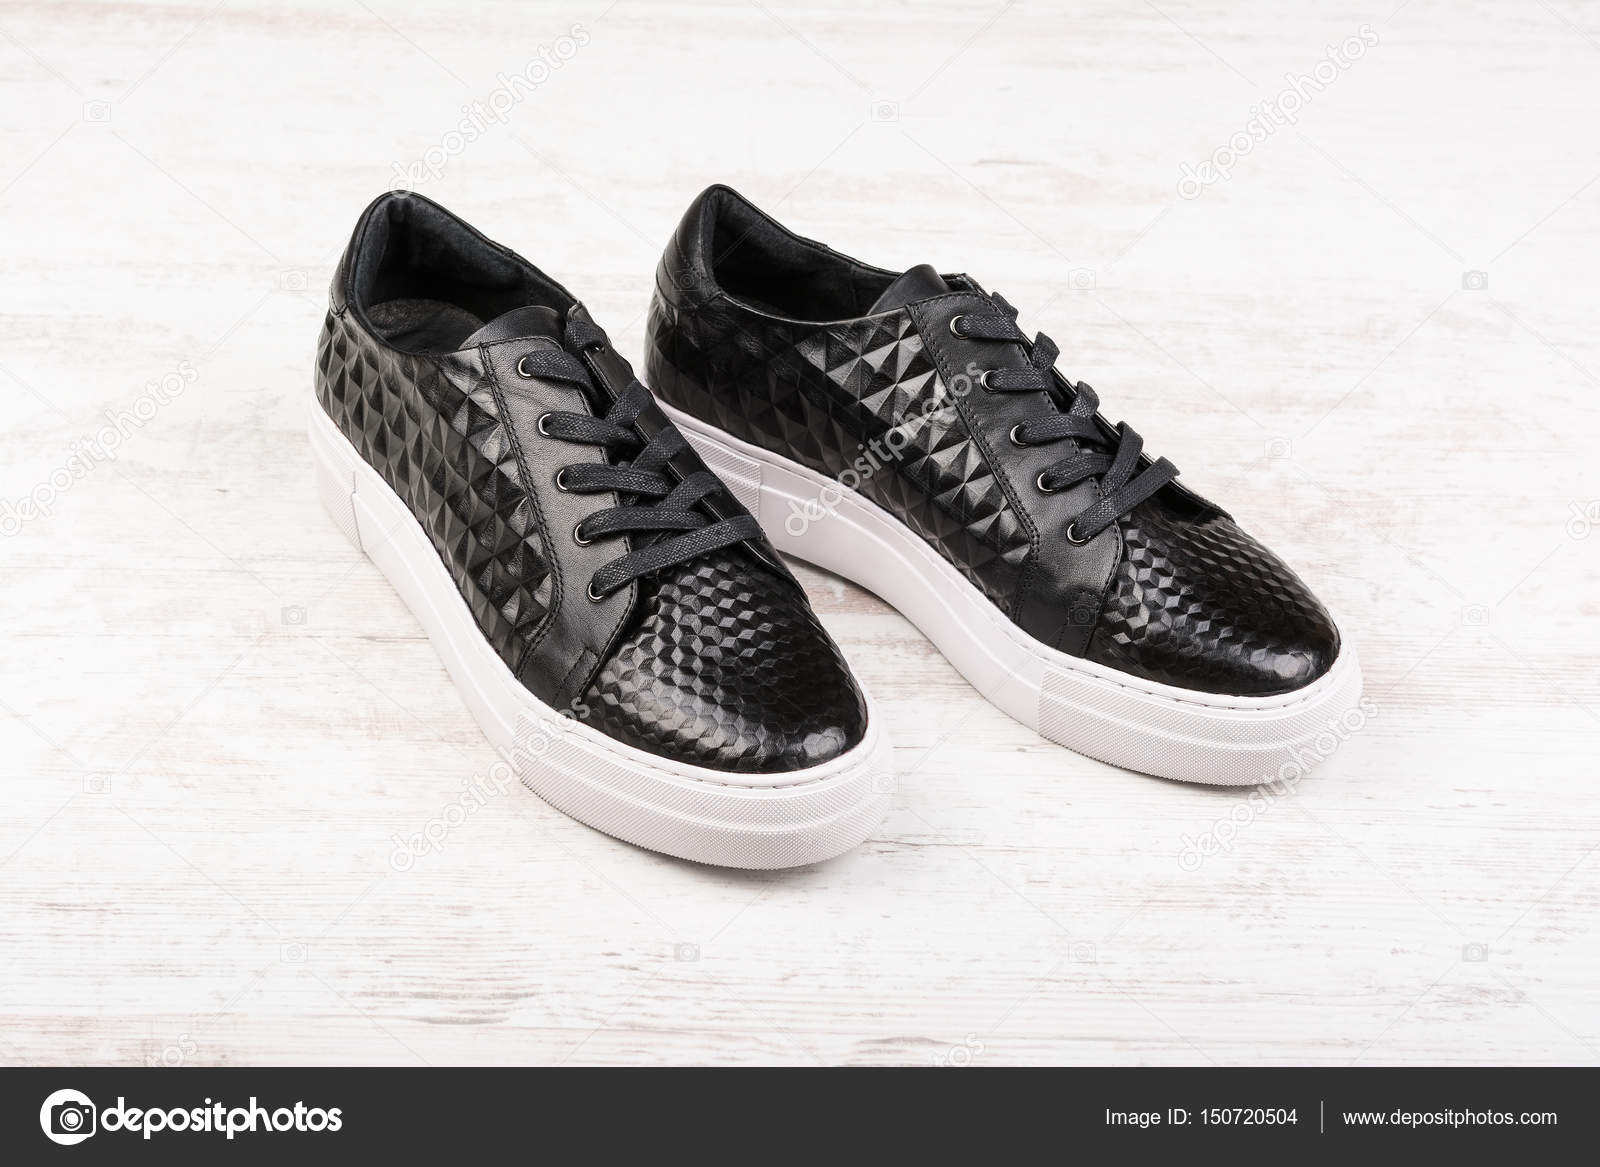 eec4e26cd63 Ζευγάρι μαύρα γυναικείο δερμάτινα αθλητικά παπούτσια σε άσπρο φόντο ξύλινη  — Εικόνα από ...